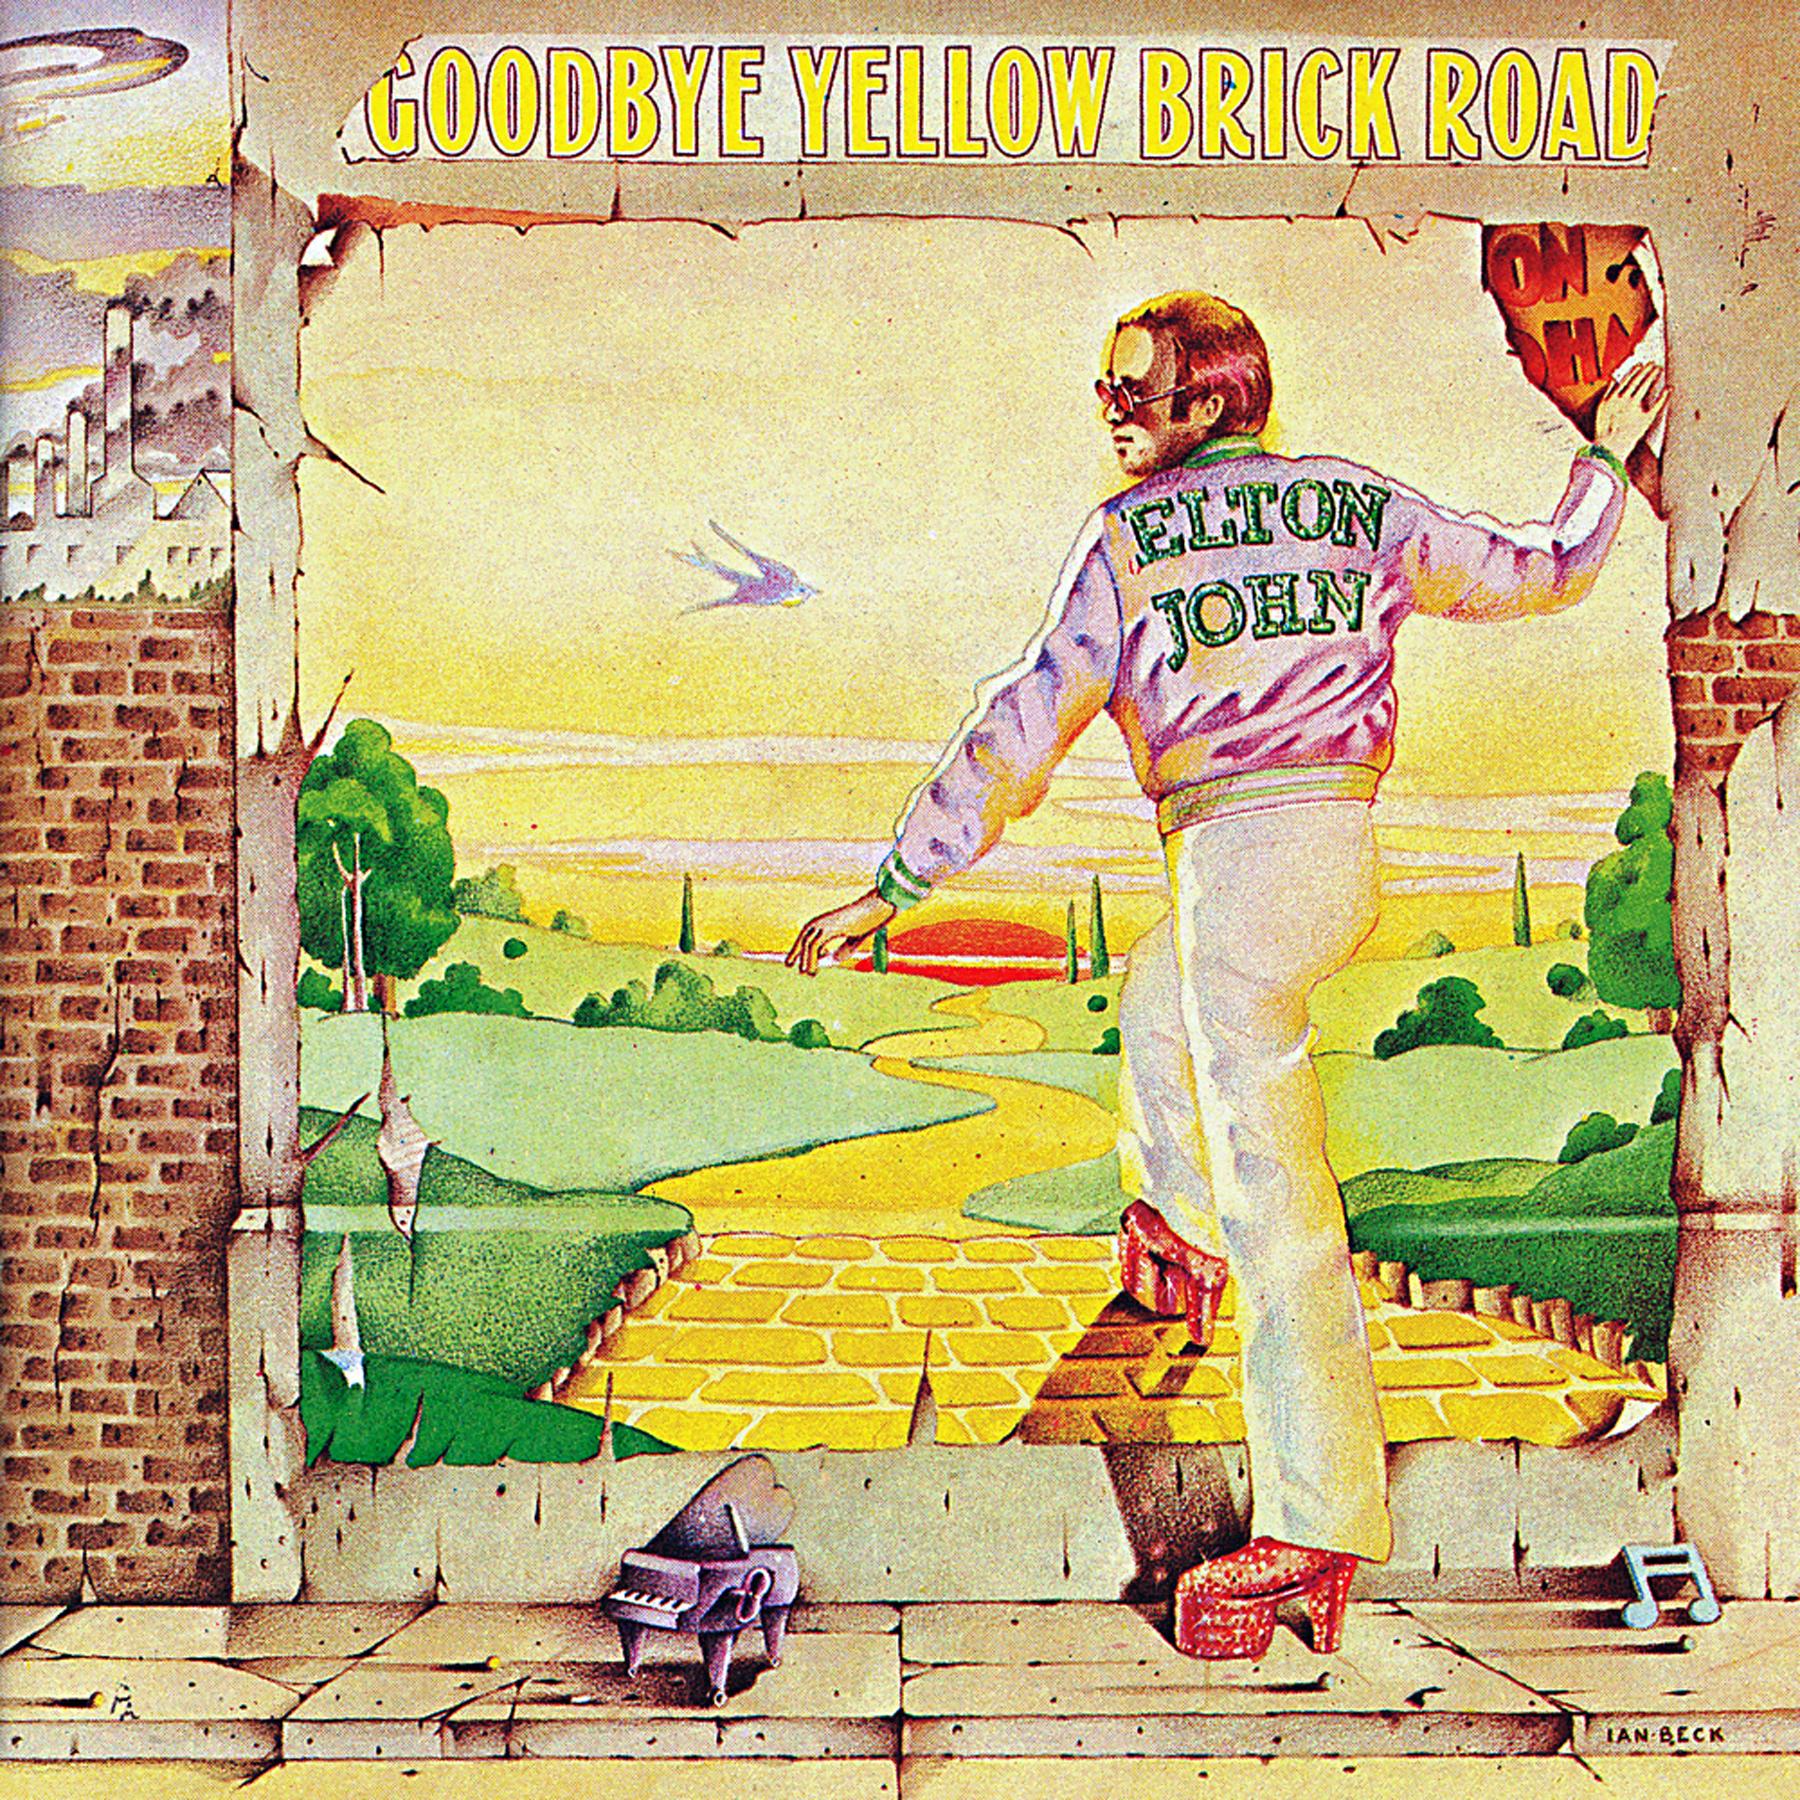 Song Lyric Artwork Music Print Poster Goodbye Yellow Brick Road by Elton John